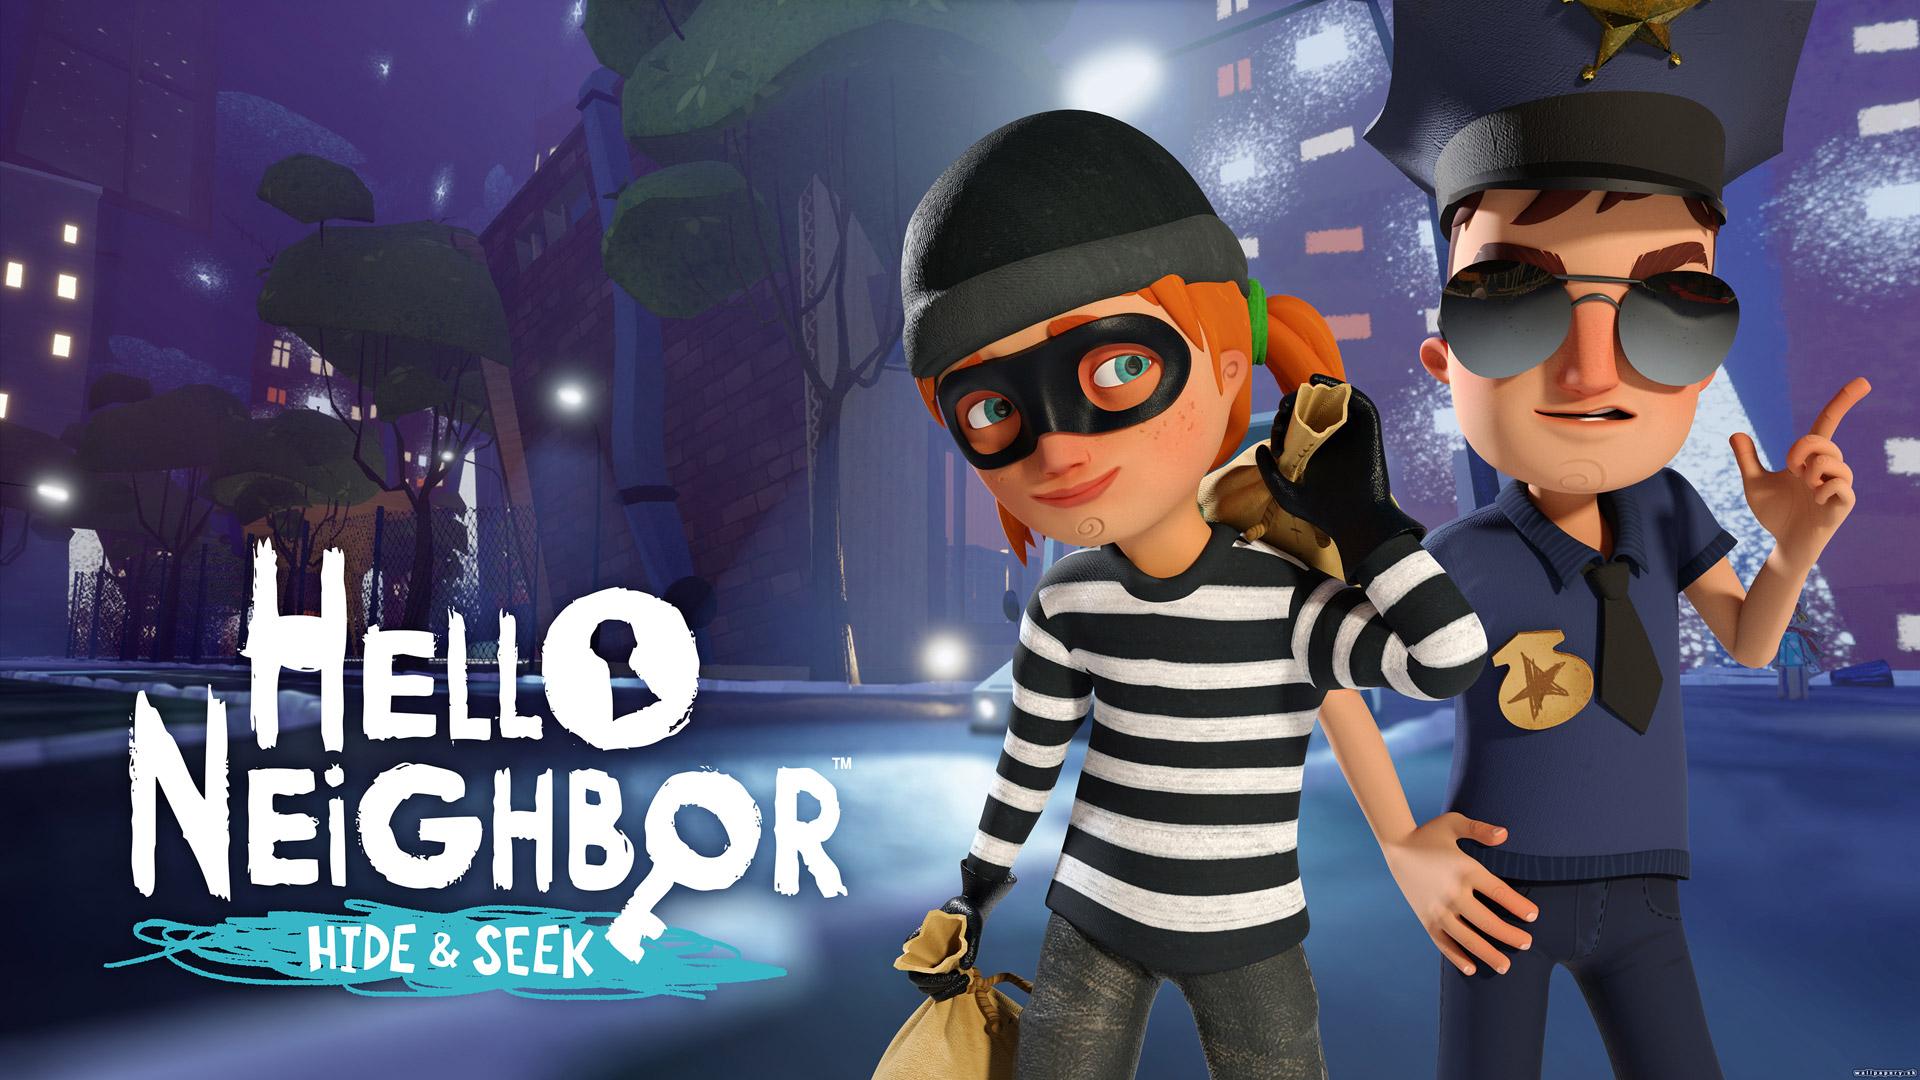 Free Hello Neighbor: Hide and Seek Wallpaper in 1920x1080